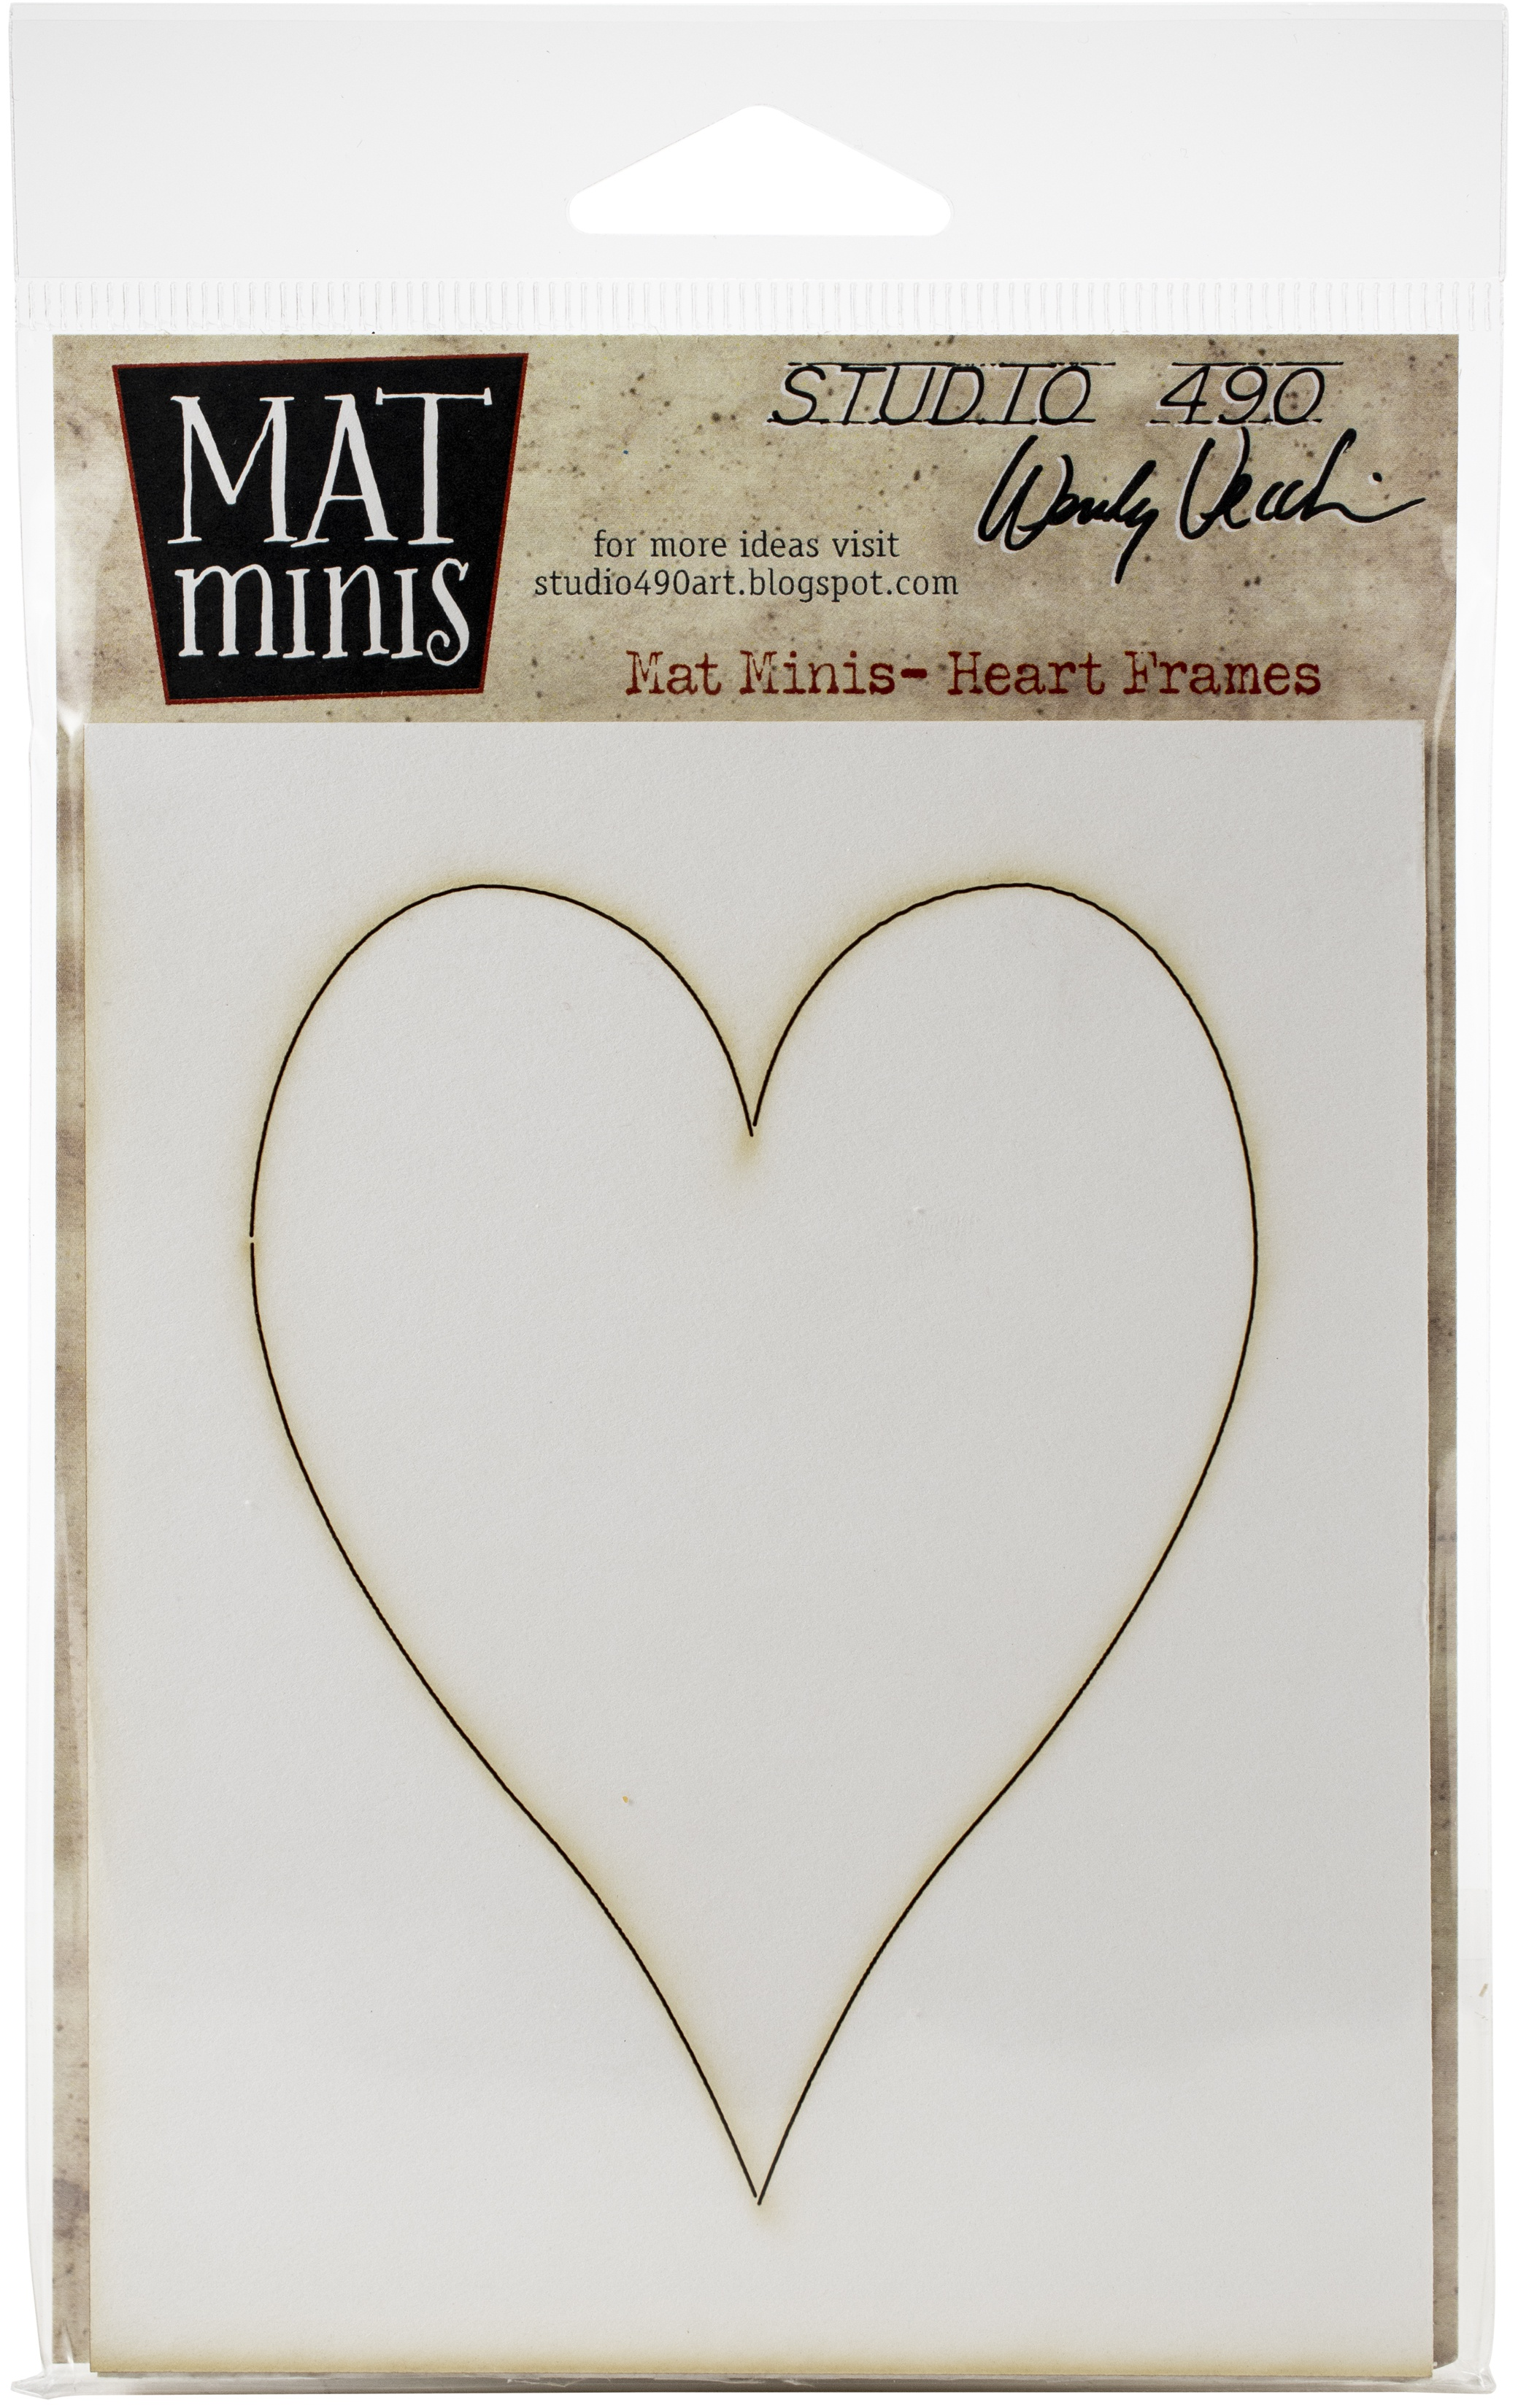 Studio 490 Wendy Vecchi Laser Cut Mat Minis-Heart Frames